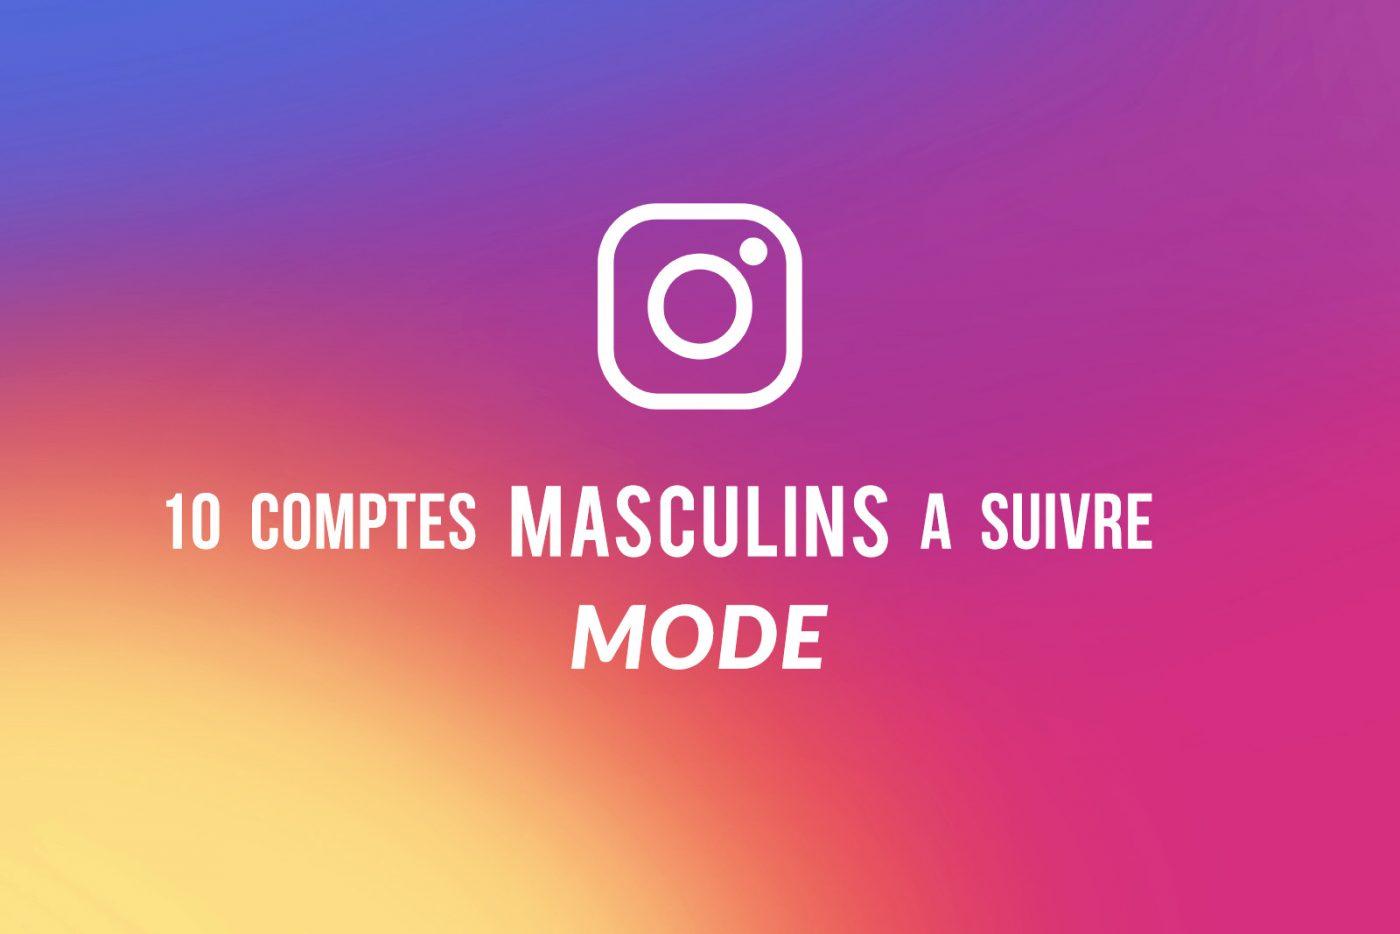 Instagram : 10 comptes masculins « Mode »  à suivre